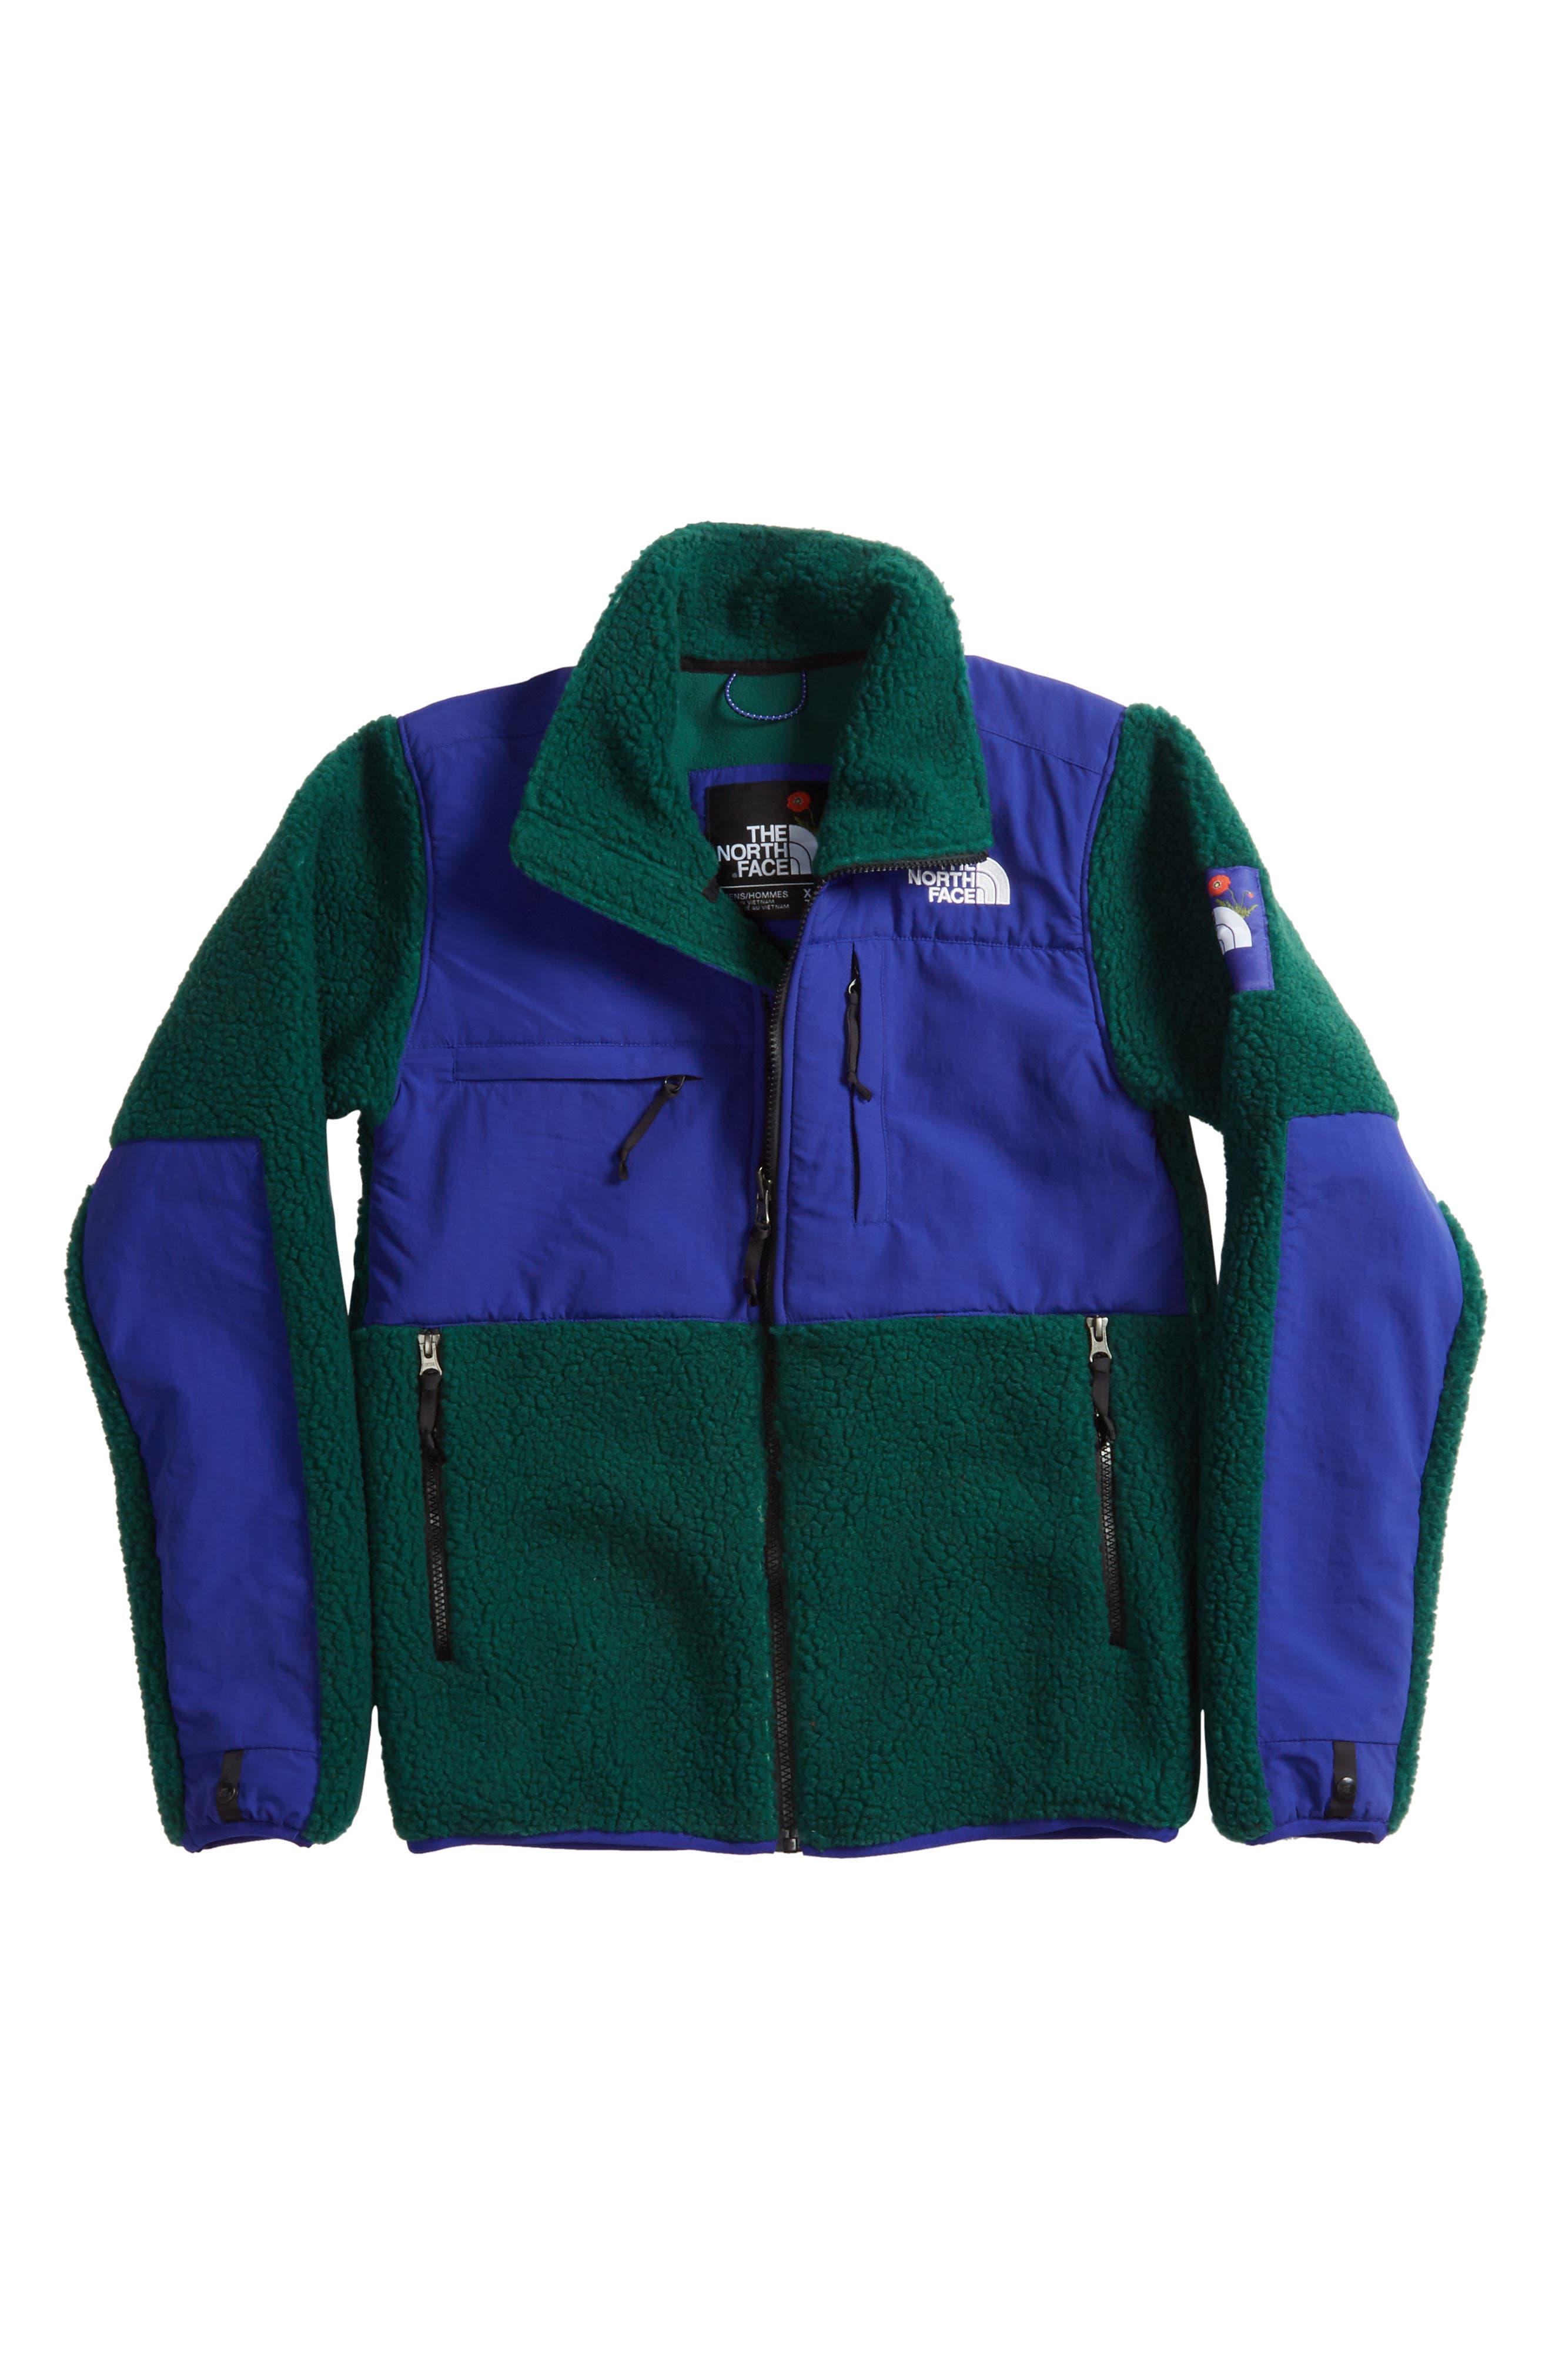 Denali Jacket,                             Alternate thumbnail 5, color,                             301